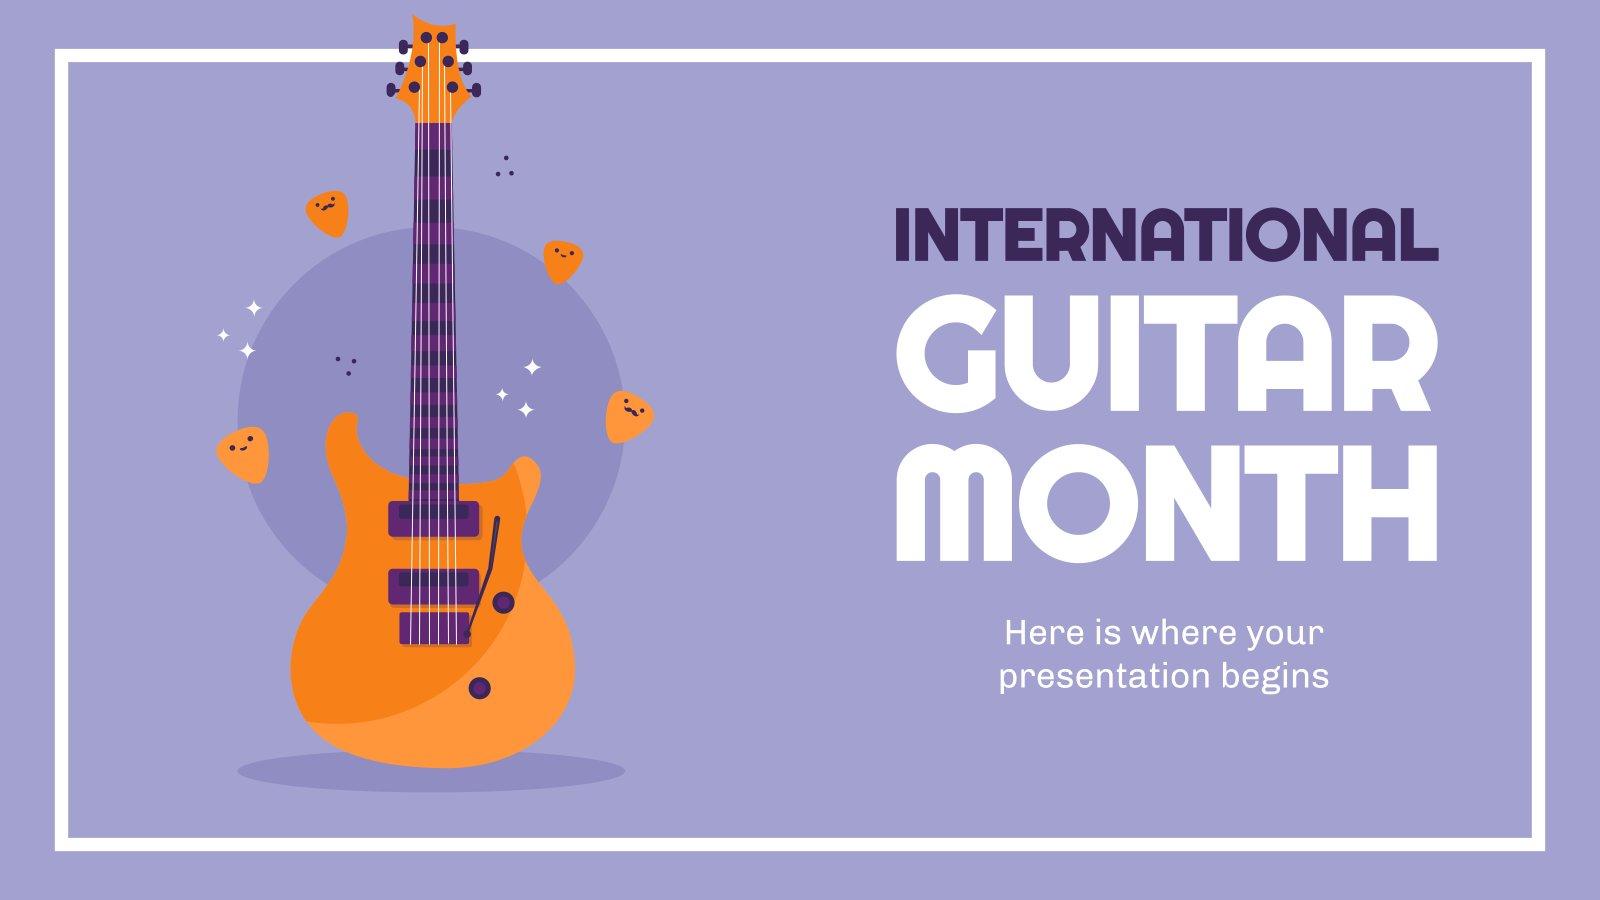 International Guitar Month presentation template